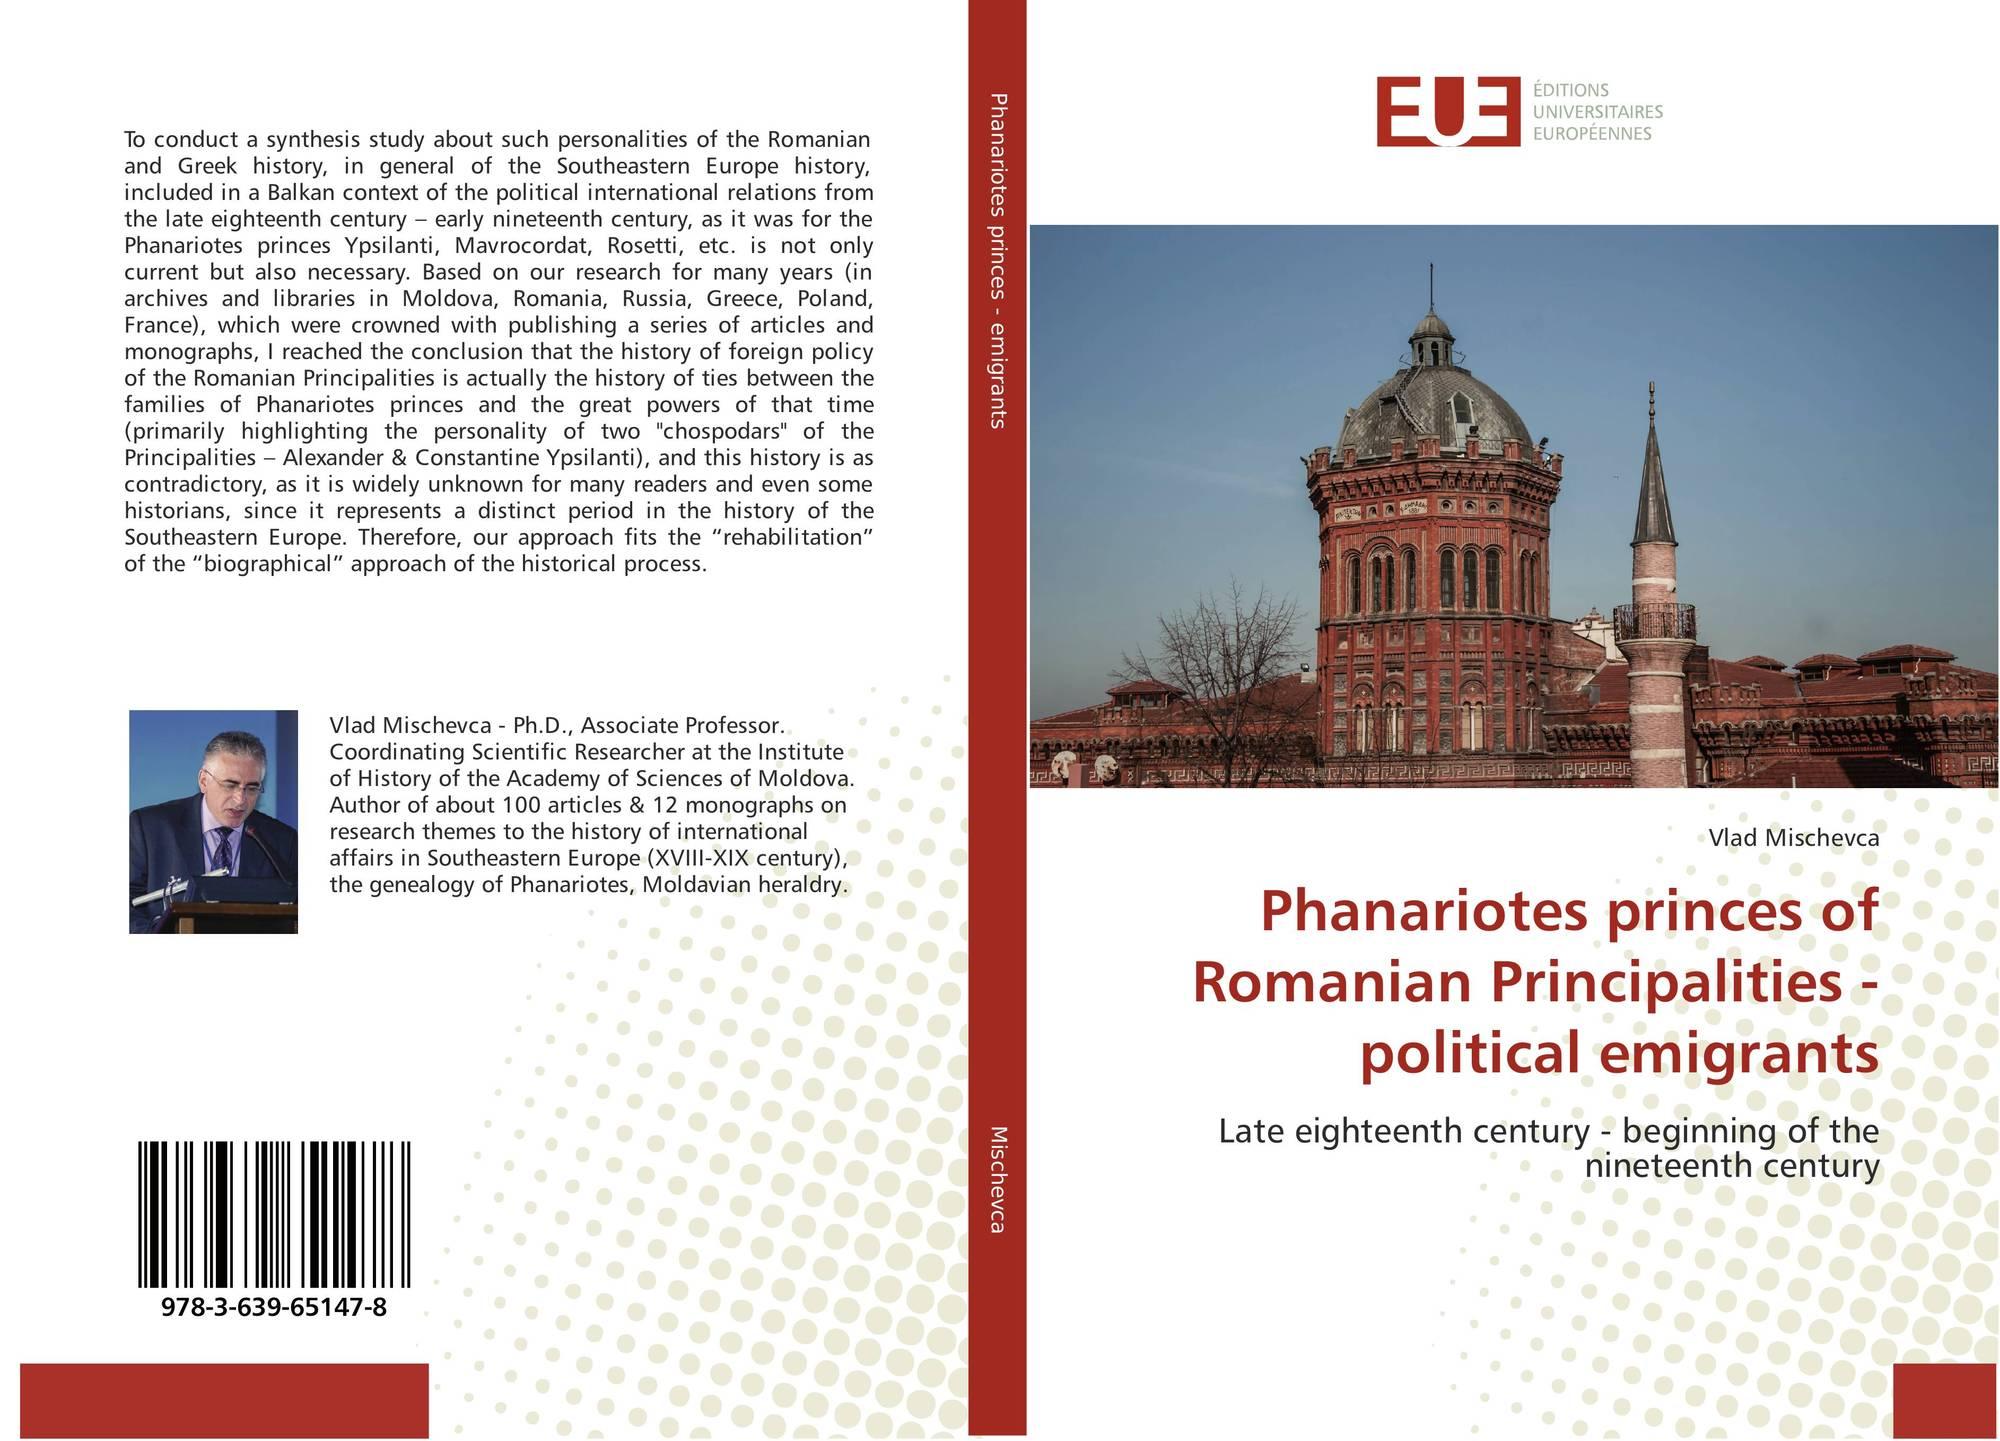 Phanariotes princes of Romanian Principalities - political emigrants